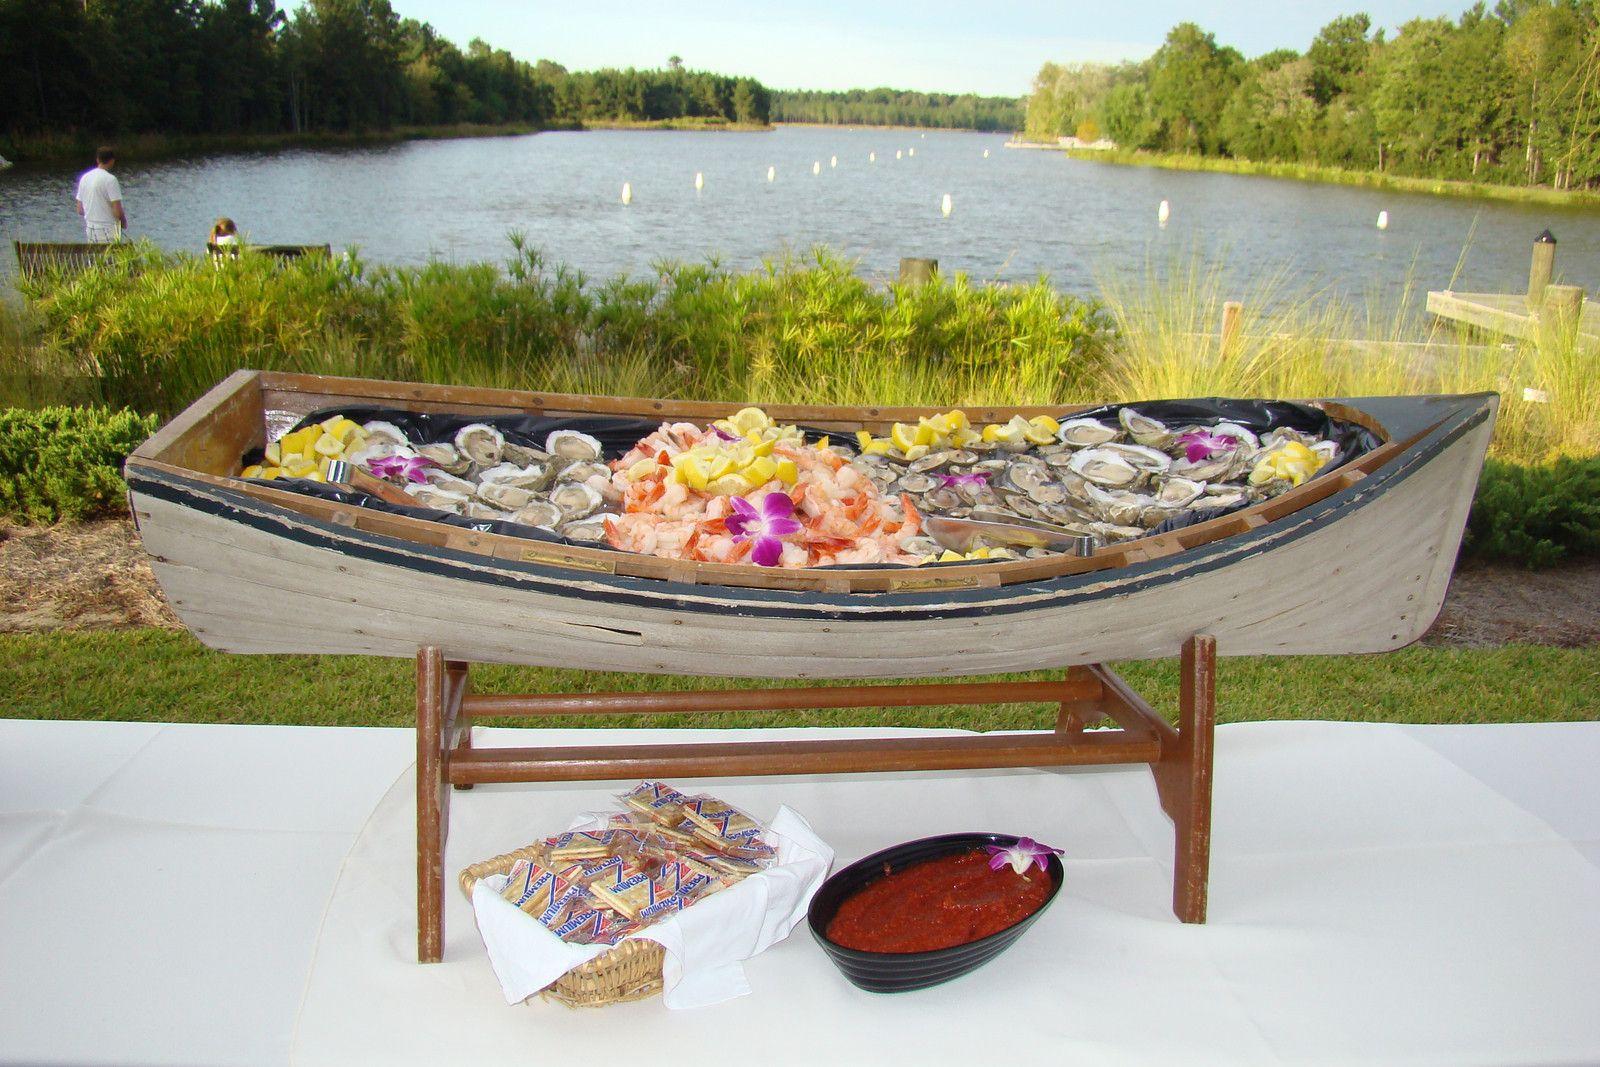 Amenities at Luxury Retirement Community The hamptons, Lake